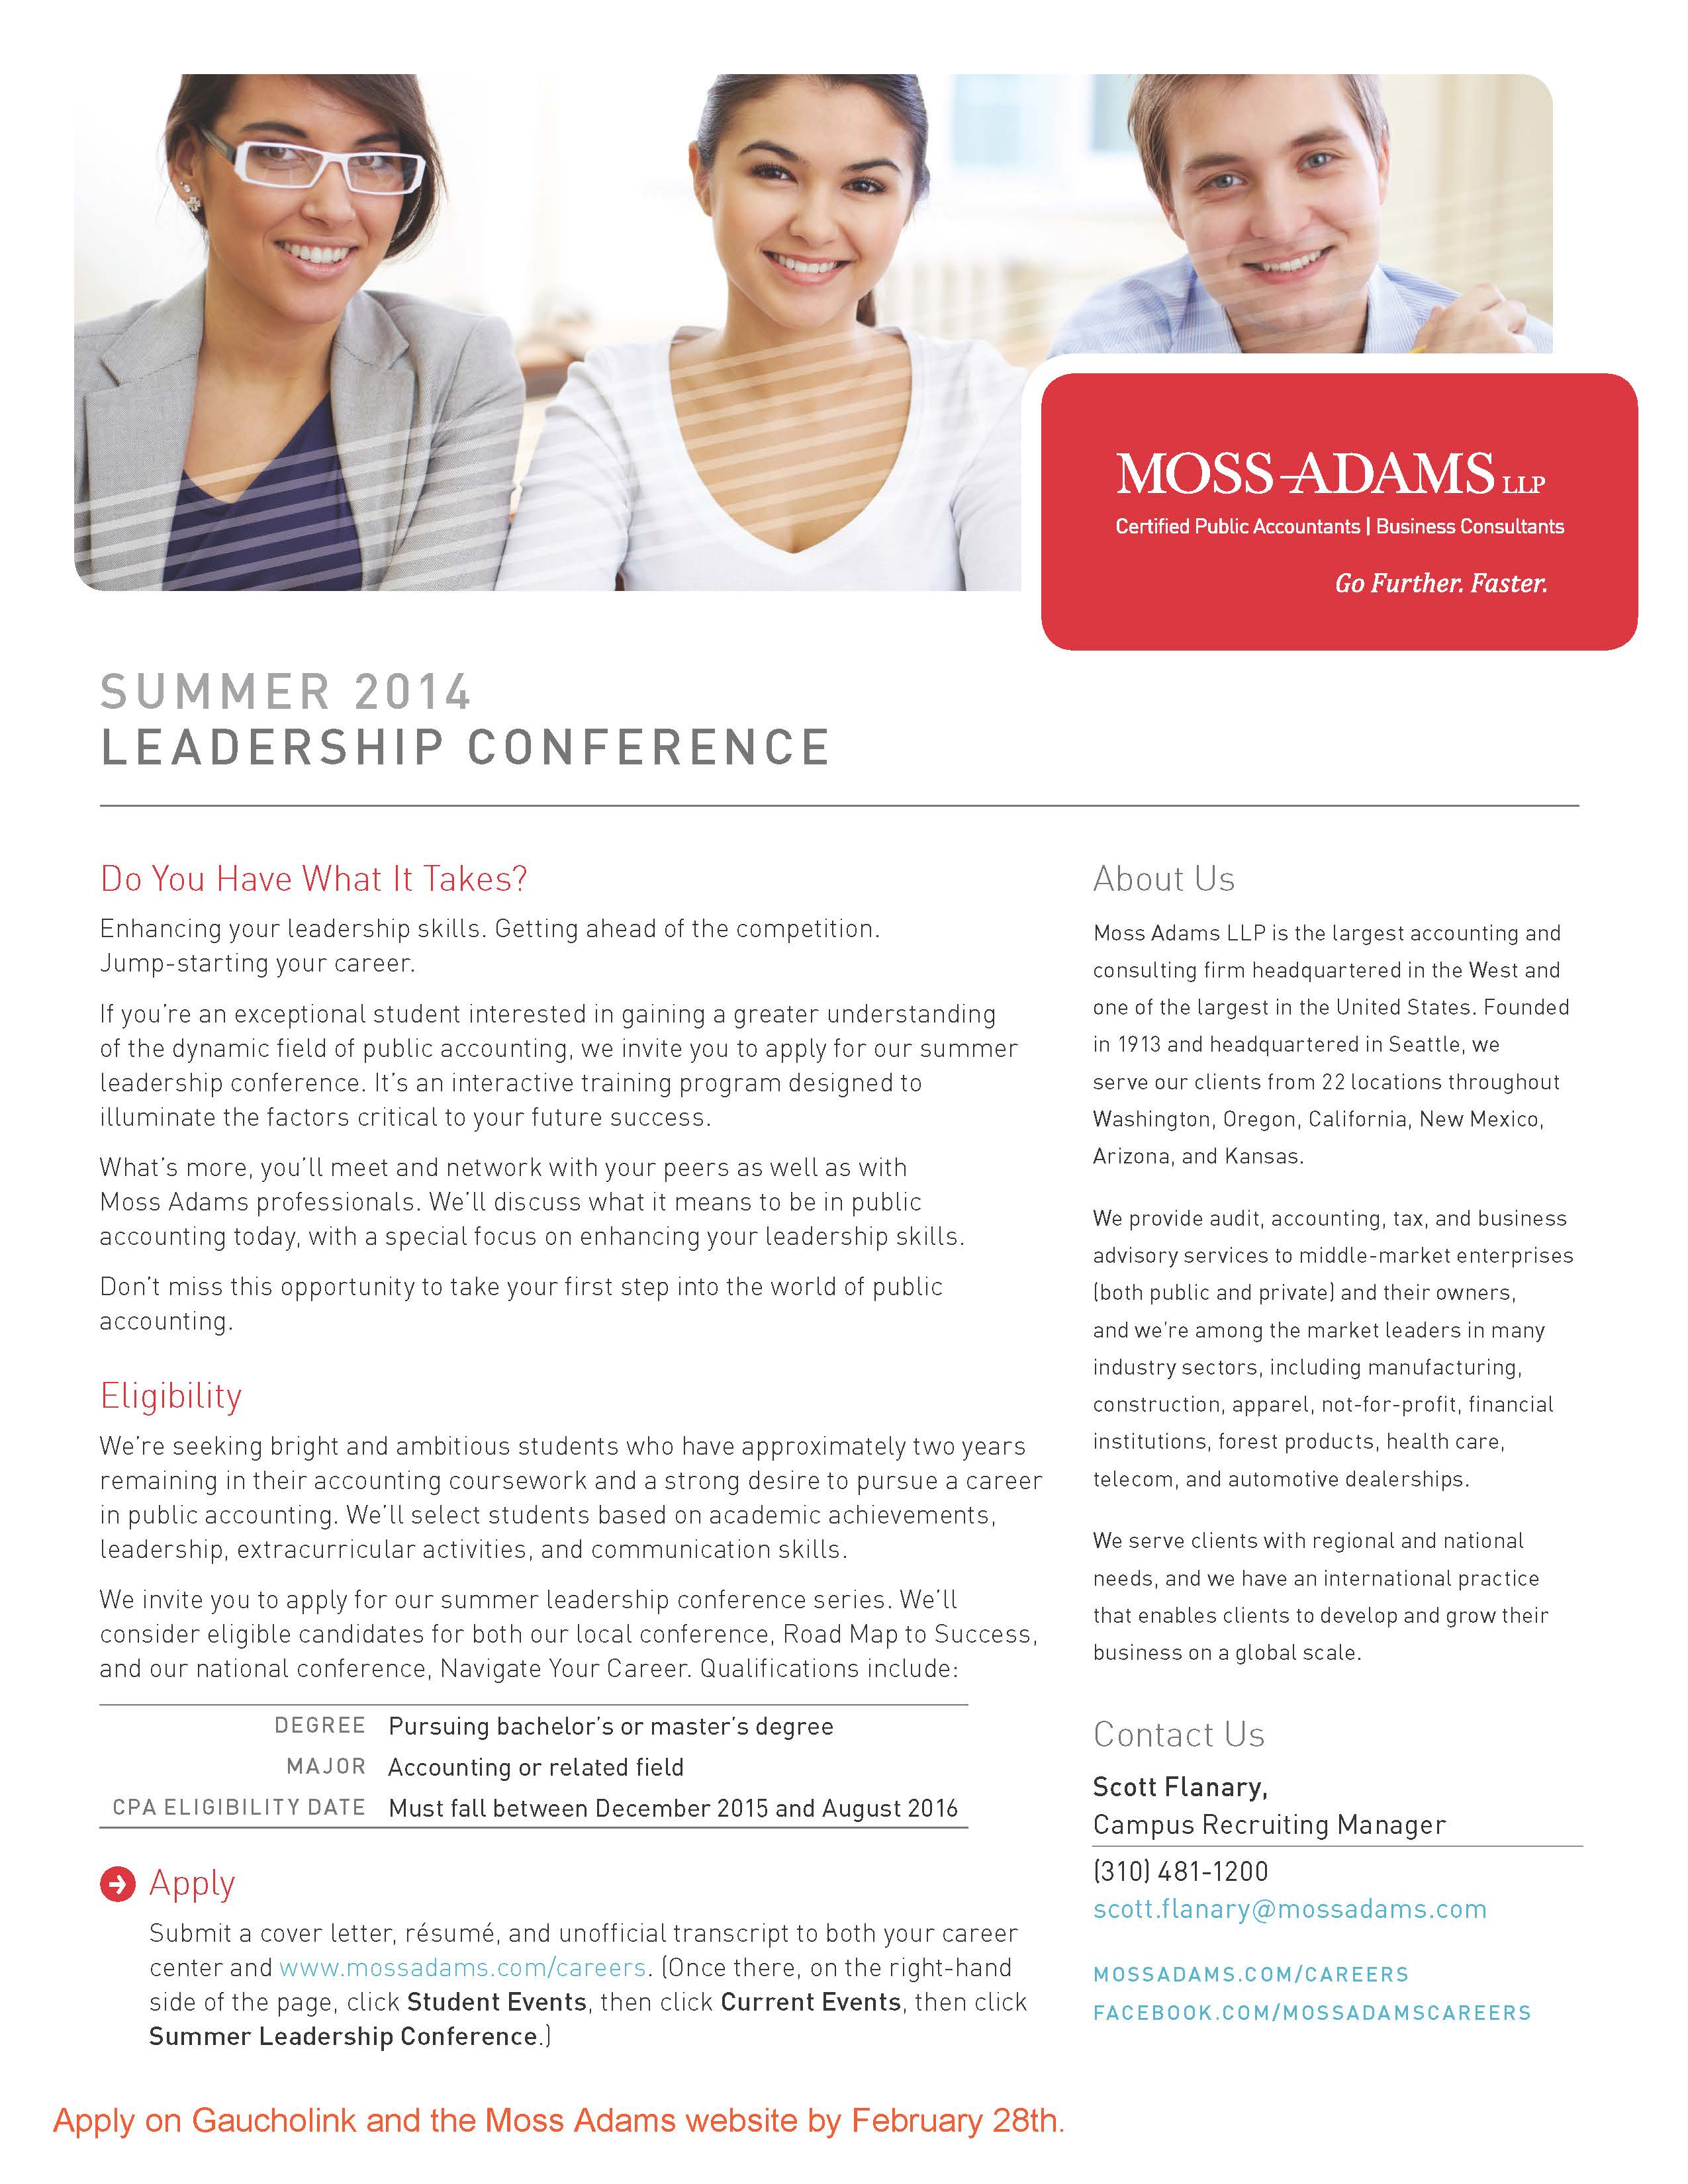 Moss Adams Summer Leadership Career Connection